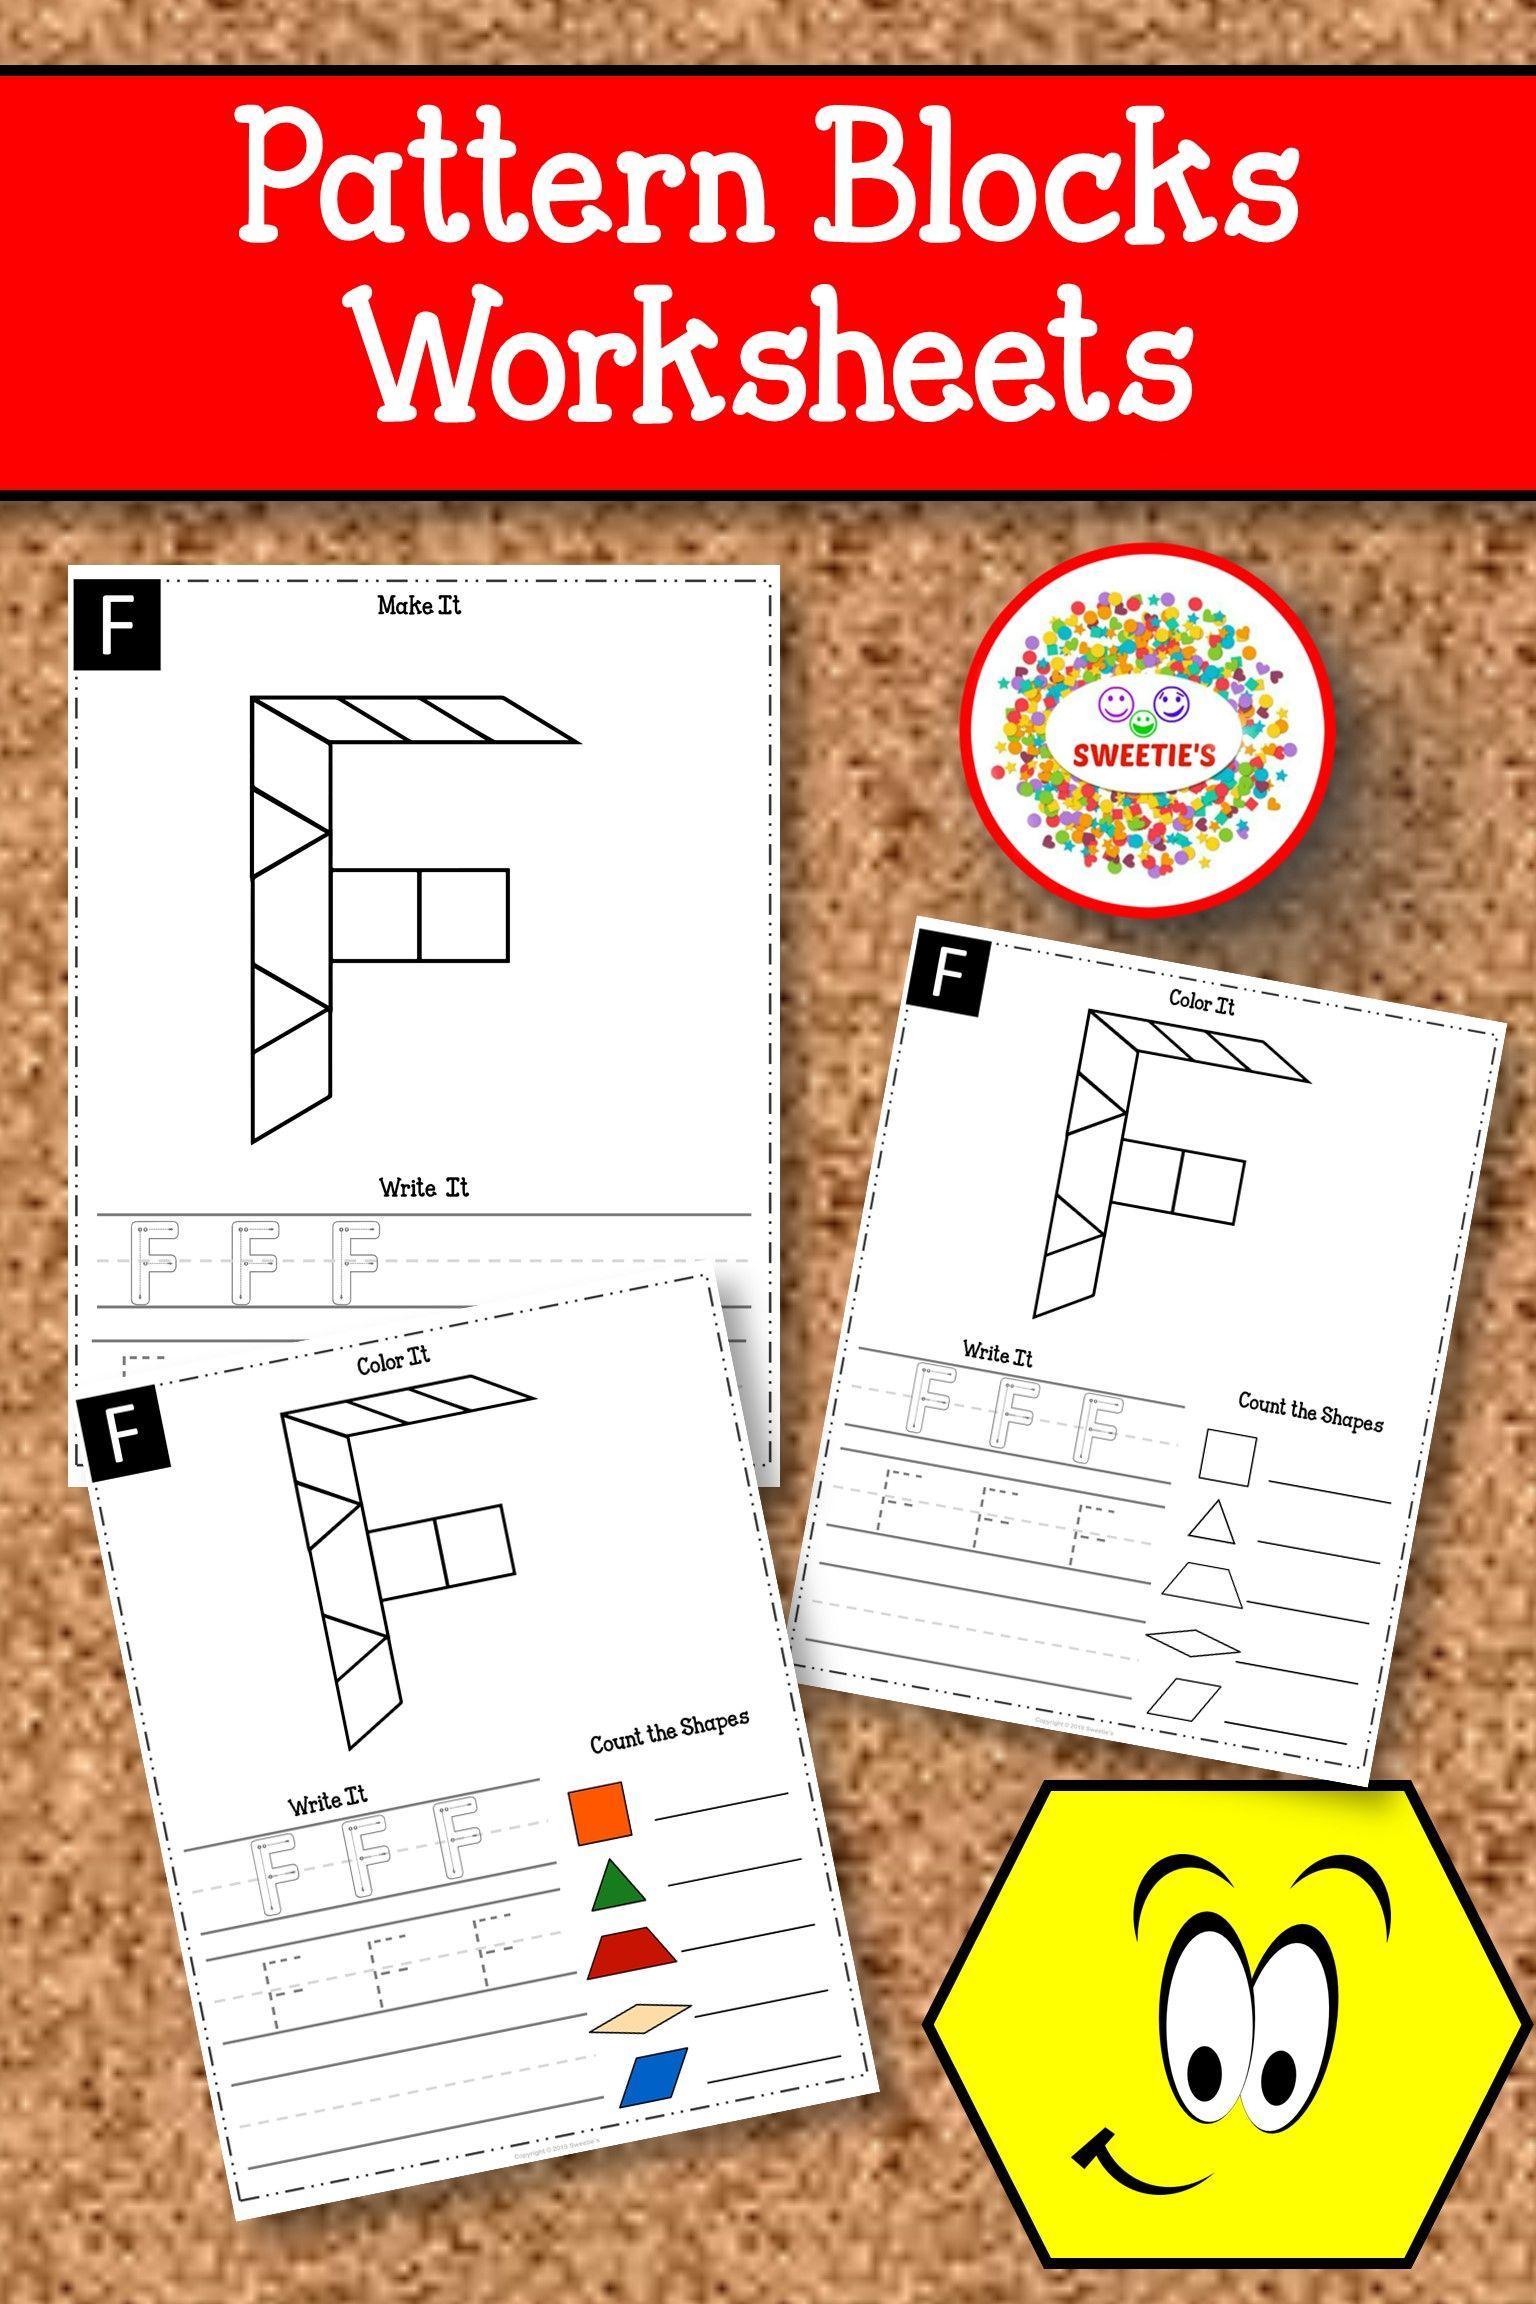 Pattern Block Worksheets Elementary Learning Tactile Learning Pattern Blocks [ 2304 x 1536 Pixel ]